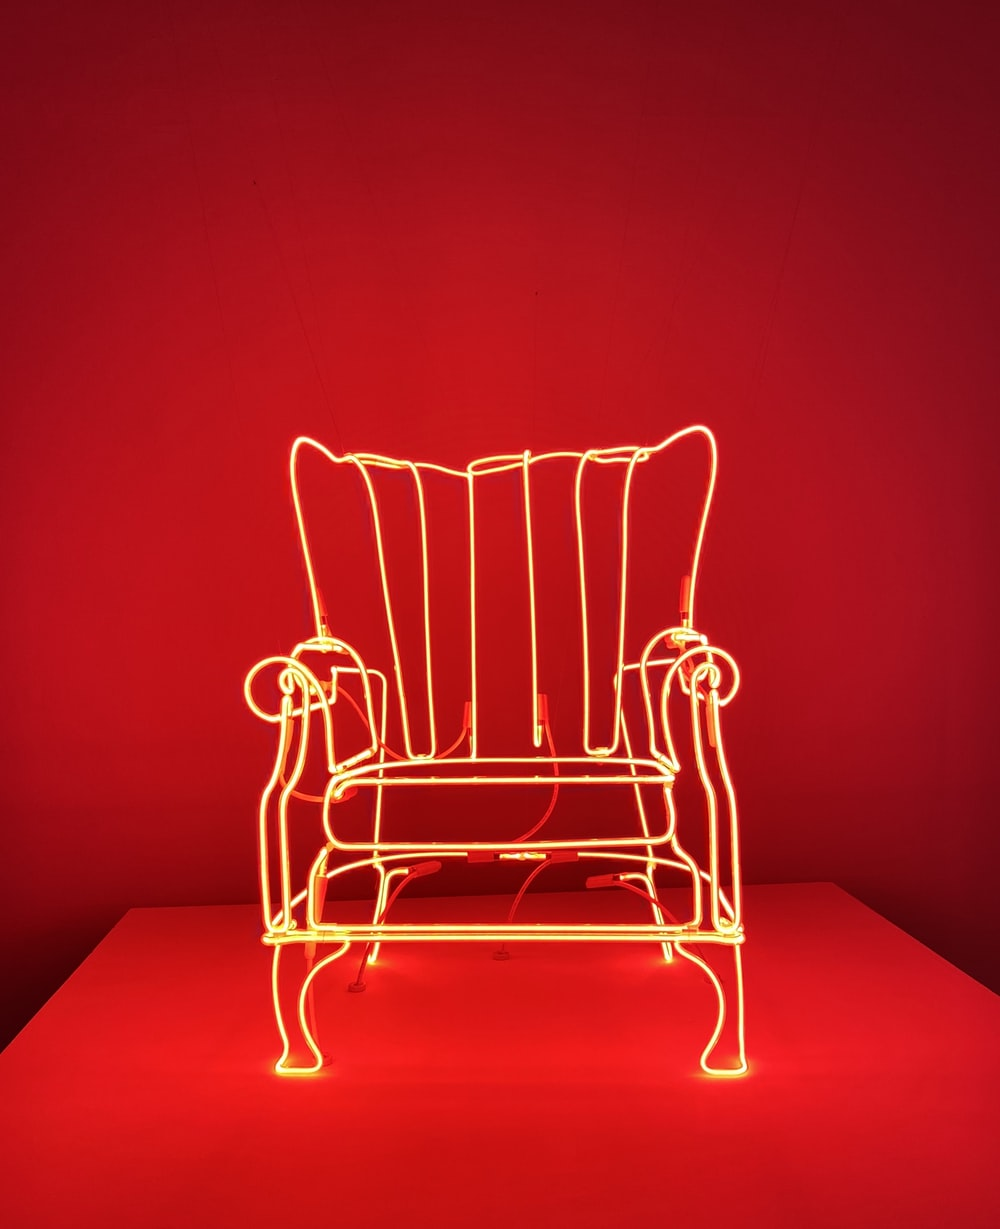 sofa chair illustration